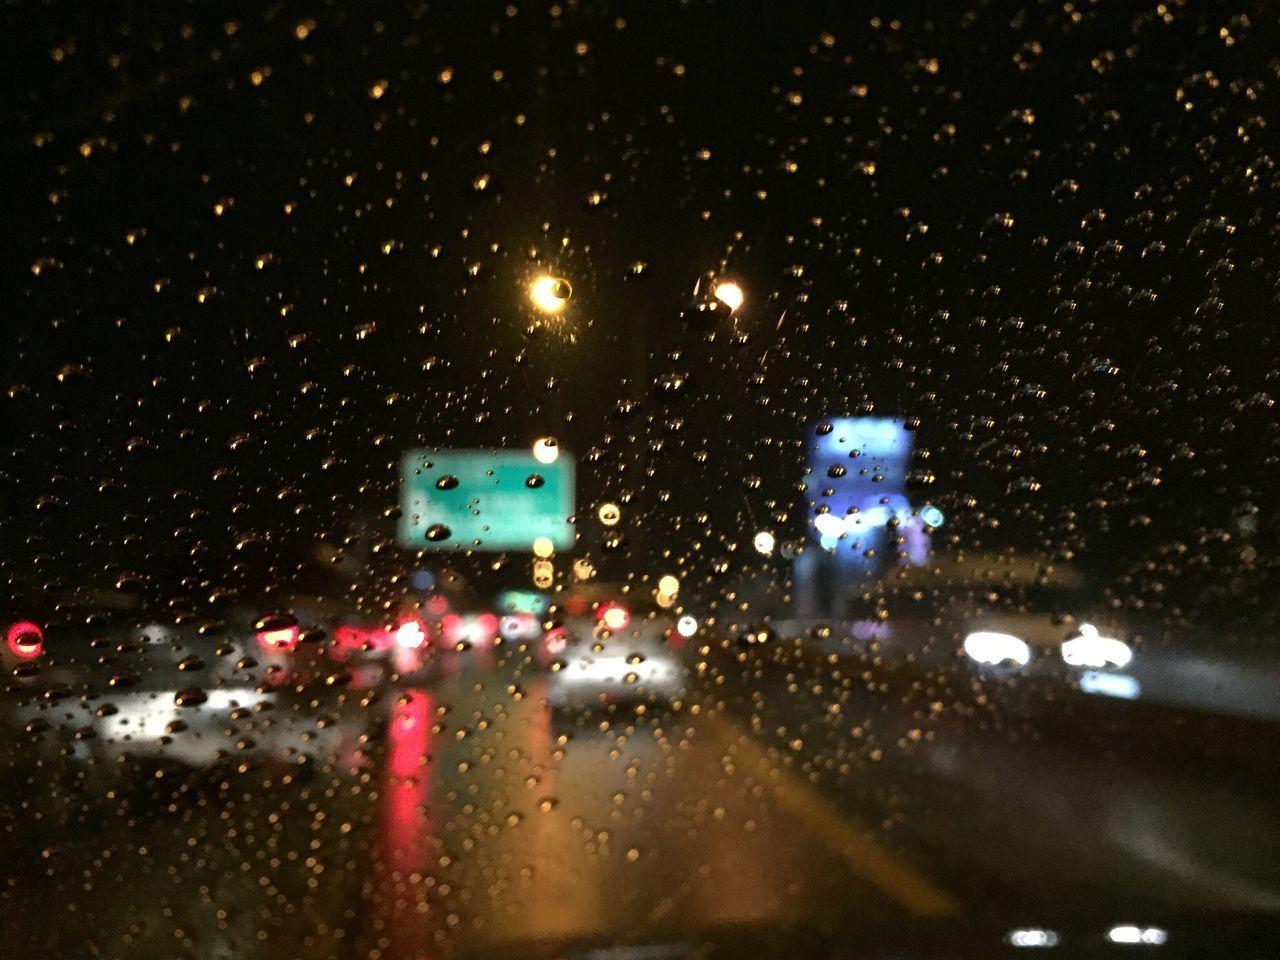 illuminated, night, rain, raindrop, weather, transportation, wet, rainy season, no people, drop, land vehicle, window, car, outdoors, city, water, architecture, close-up, sky